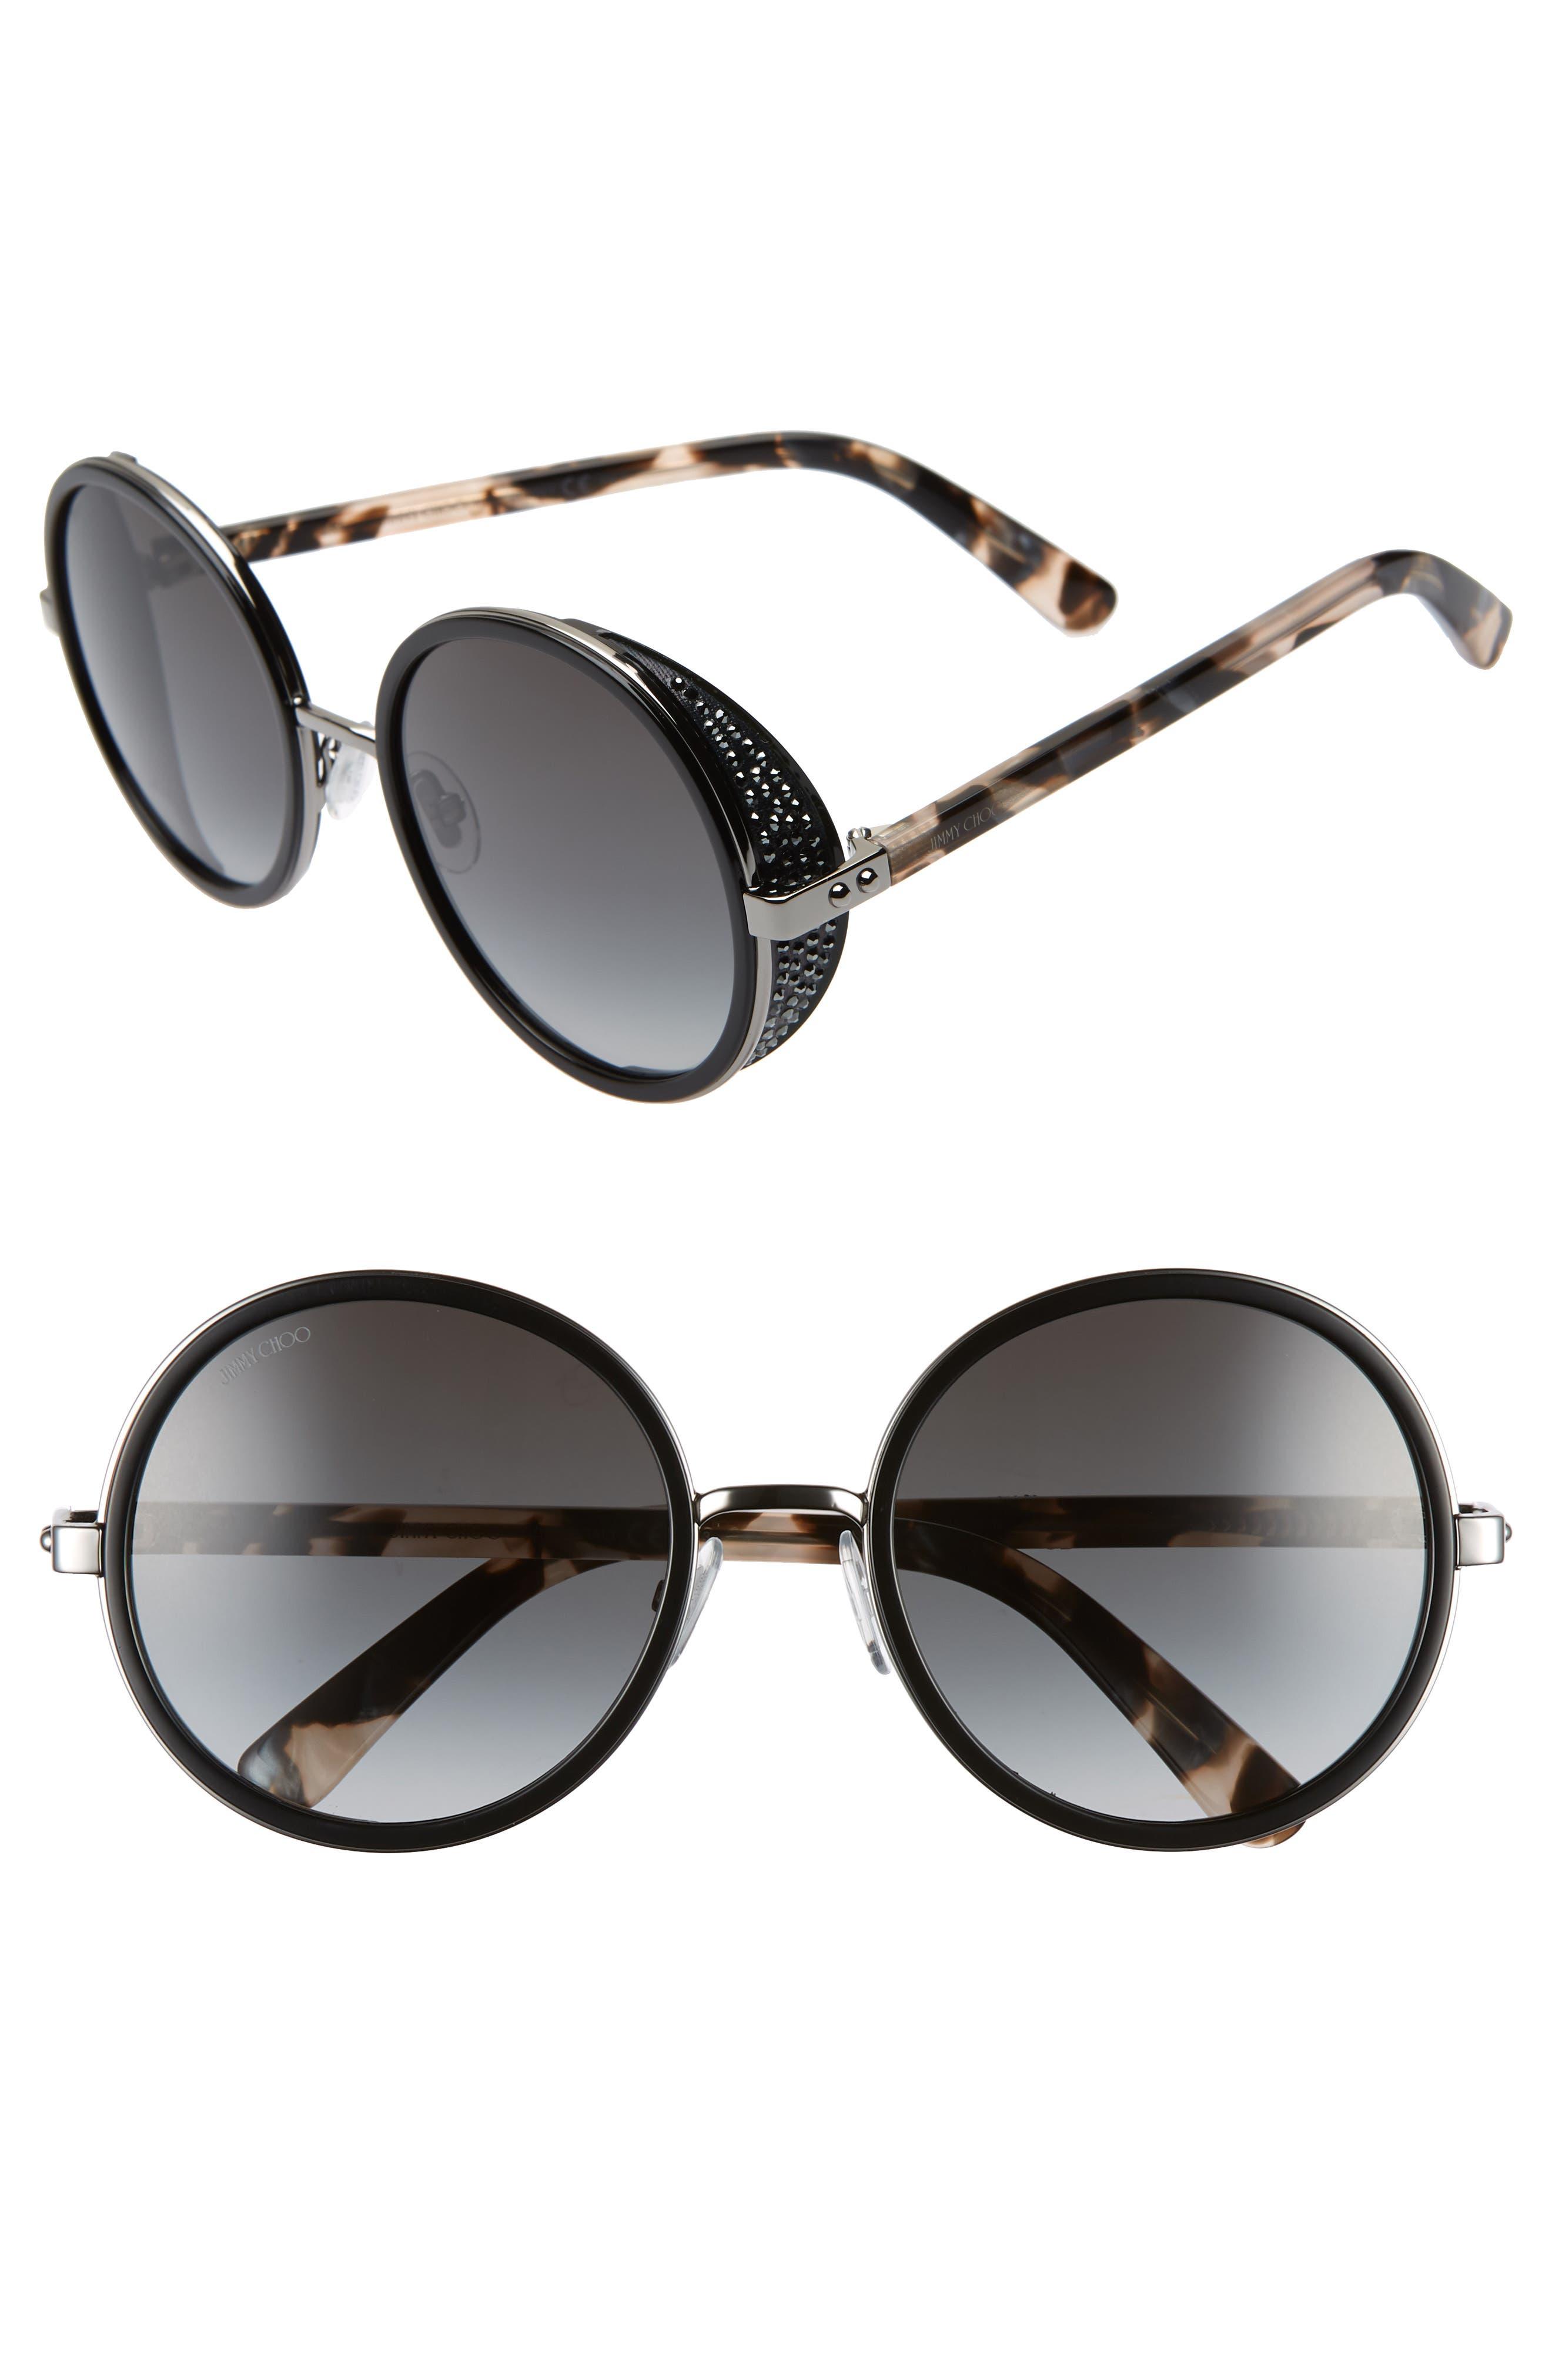 Andiens 54mm Round Sunglasses,                         Main,                         color, BLACK